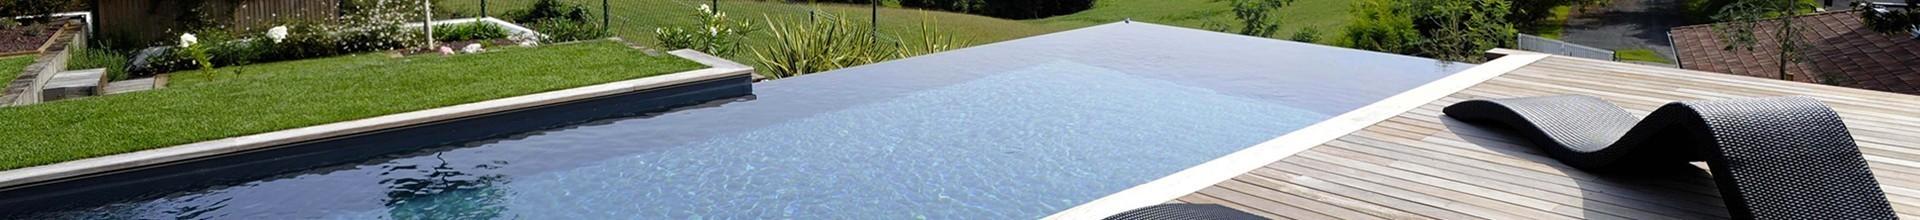 Direct usine, piscine coque prix Charente